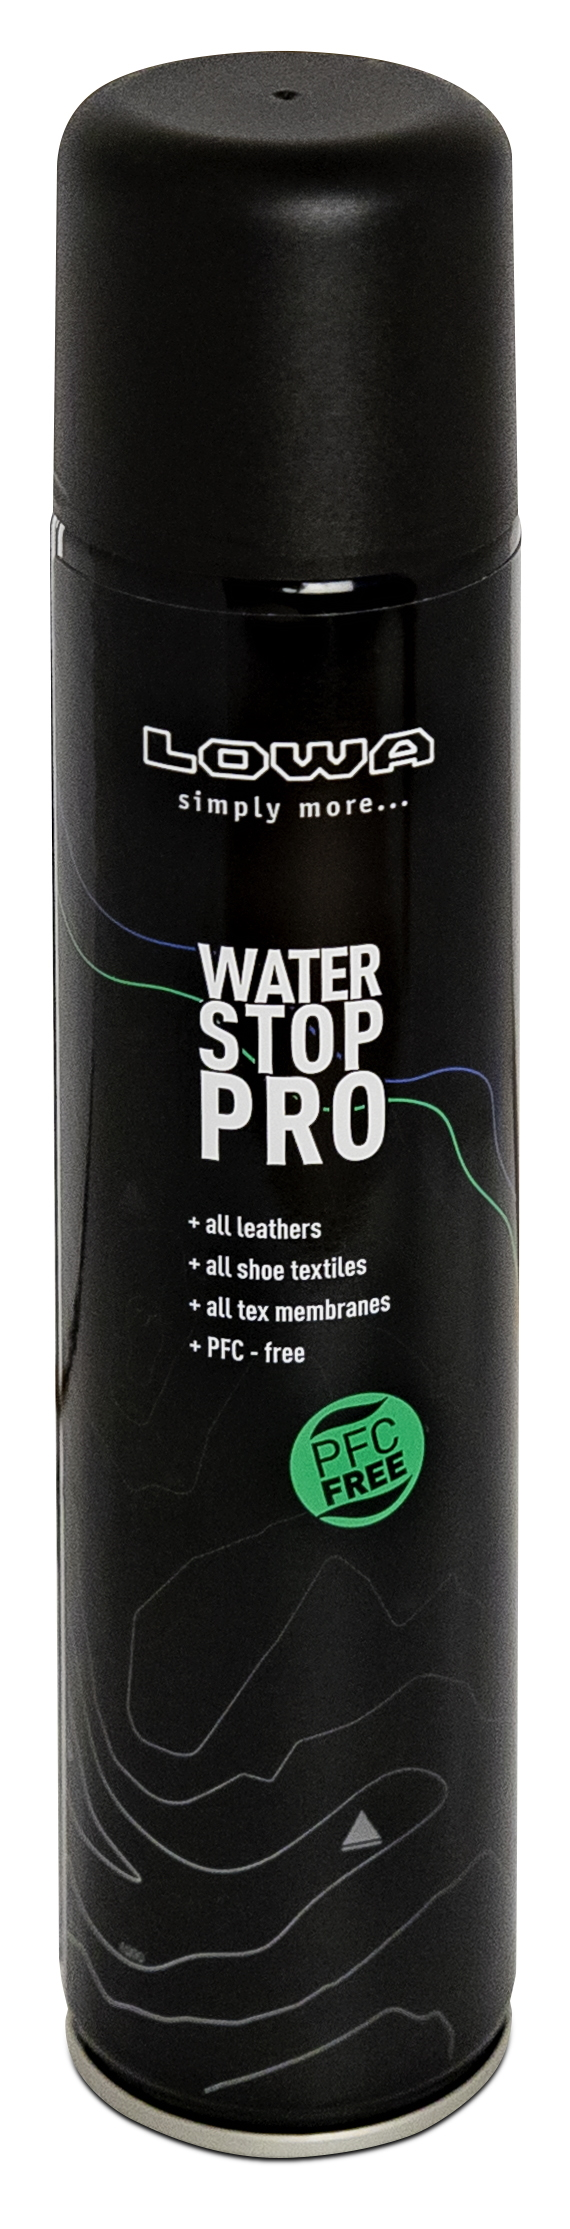 WATER STOP PRO (300ml)